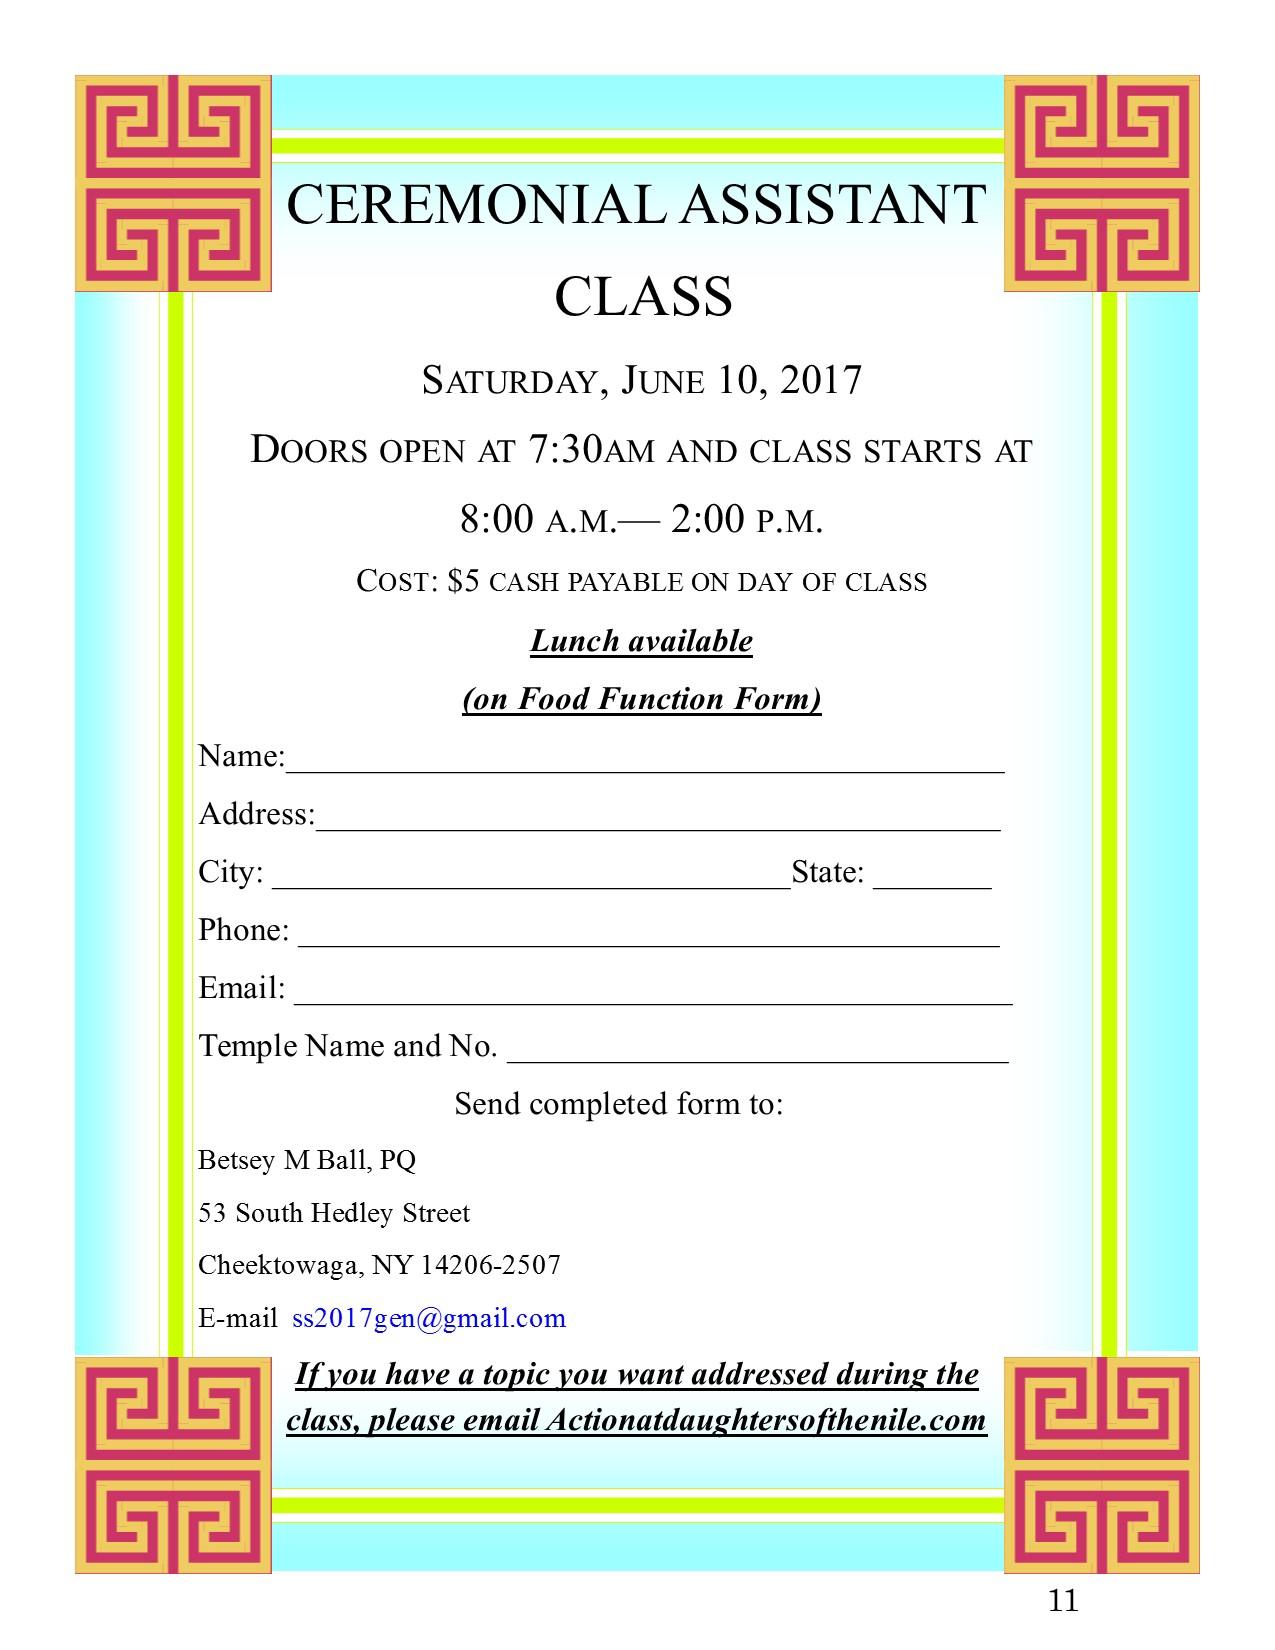 11 Ceremonial Assiatant Class flyer